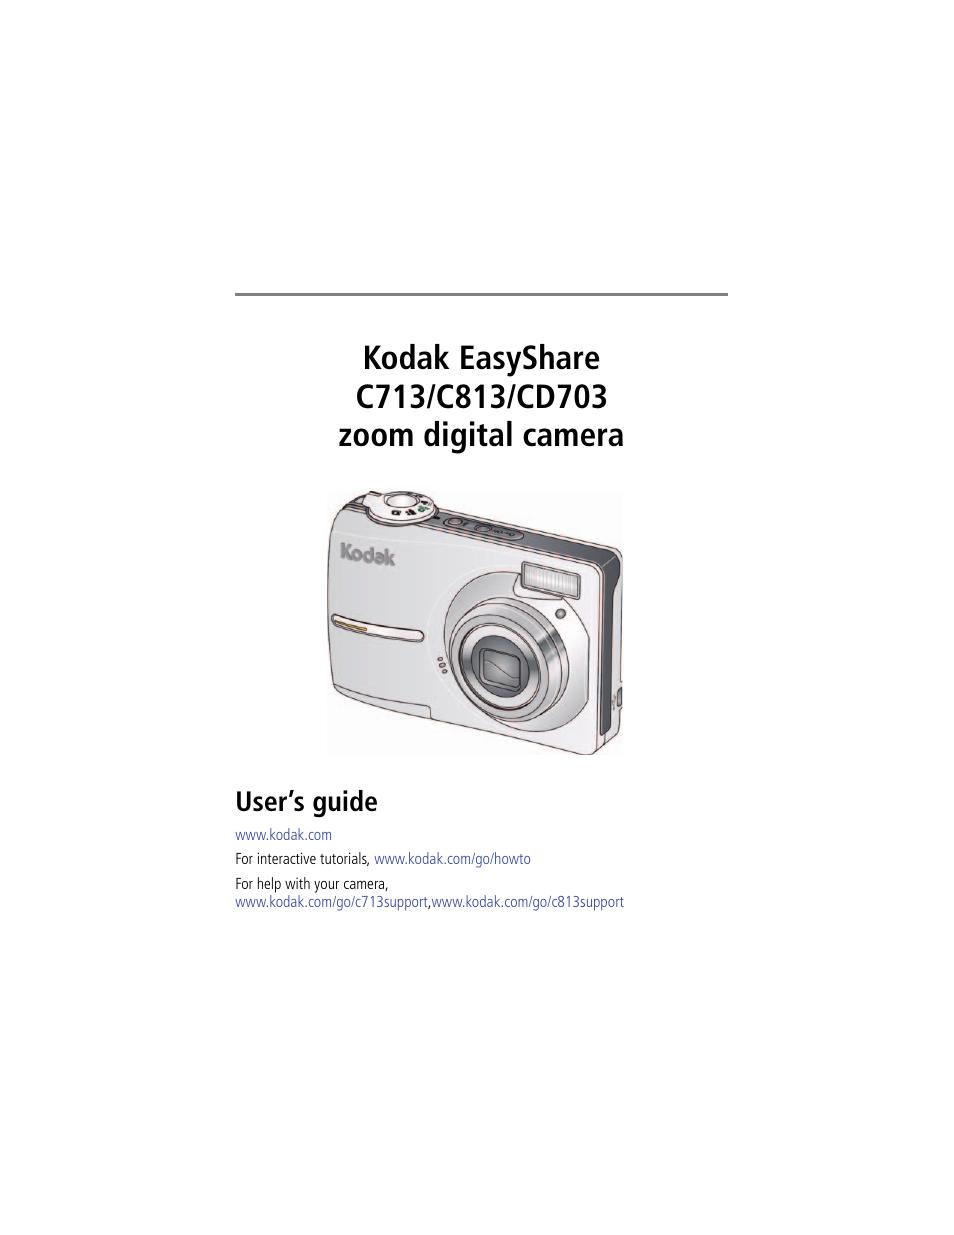 kodak easyshare c813 user manual 70 pages also for easyshare rh manualsdir com Kodak EasyShare C813 Software Kodak C713 Camera